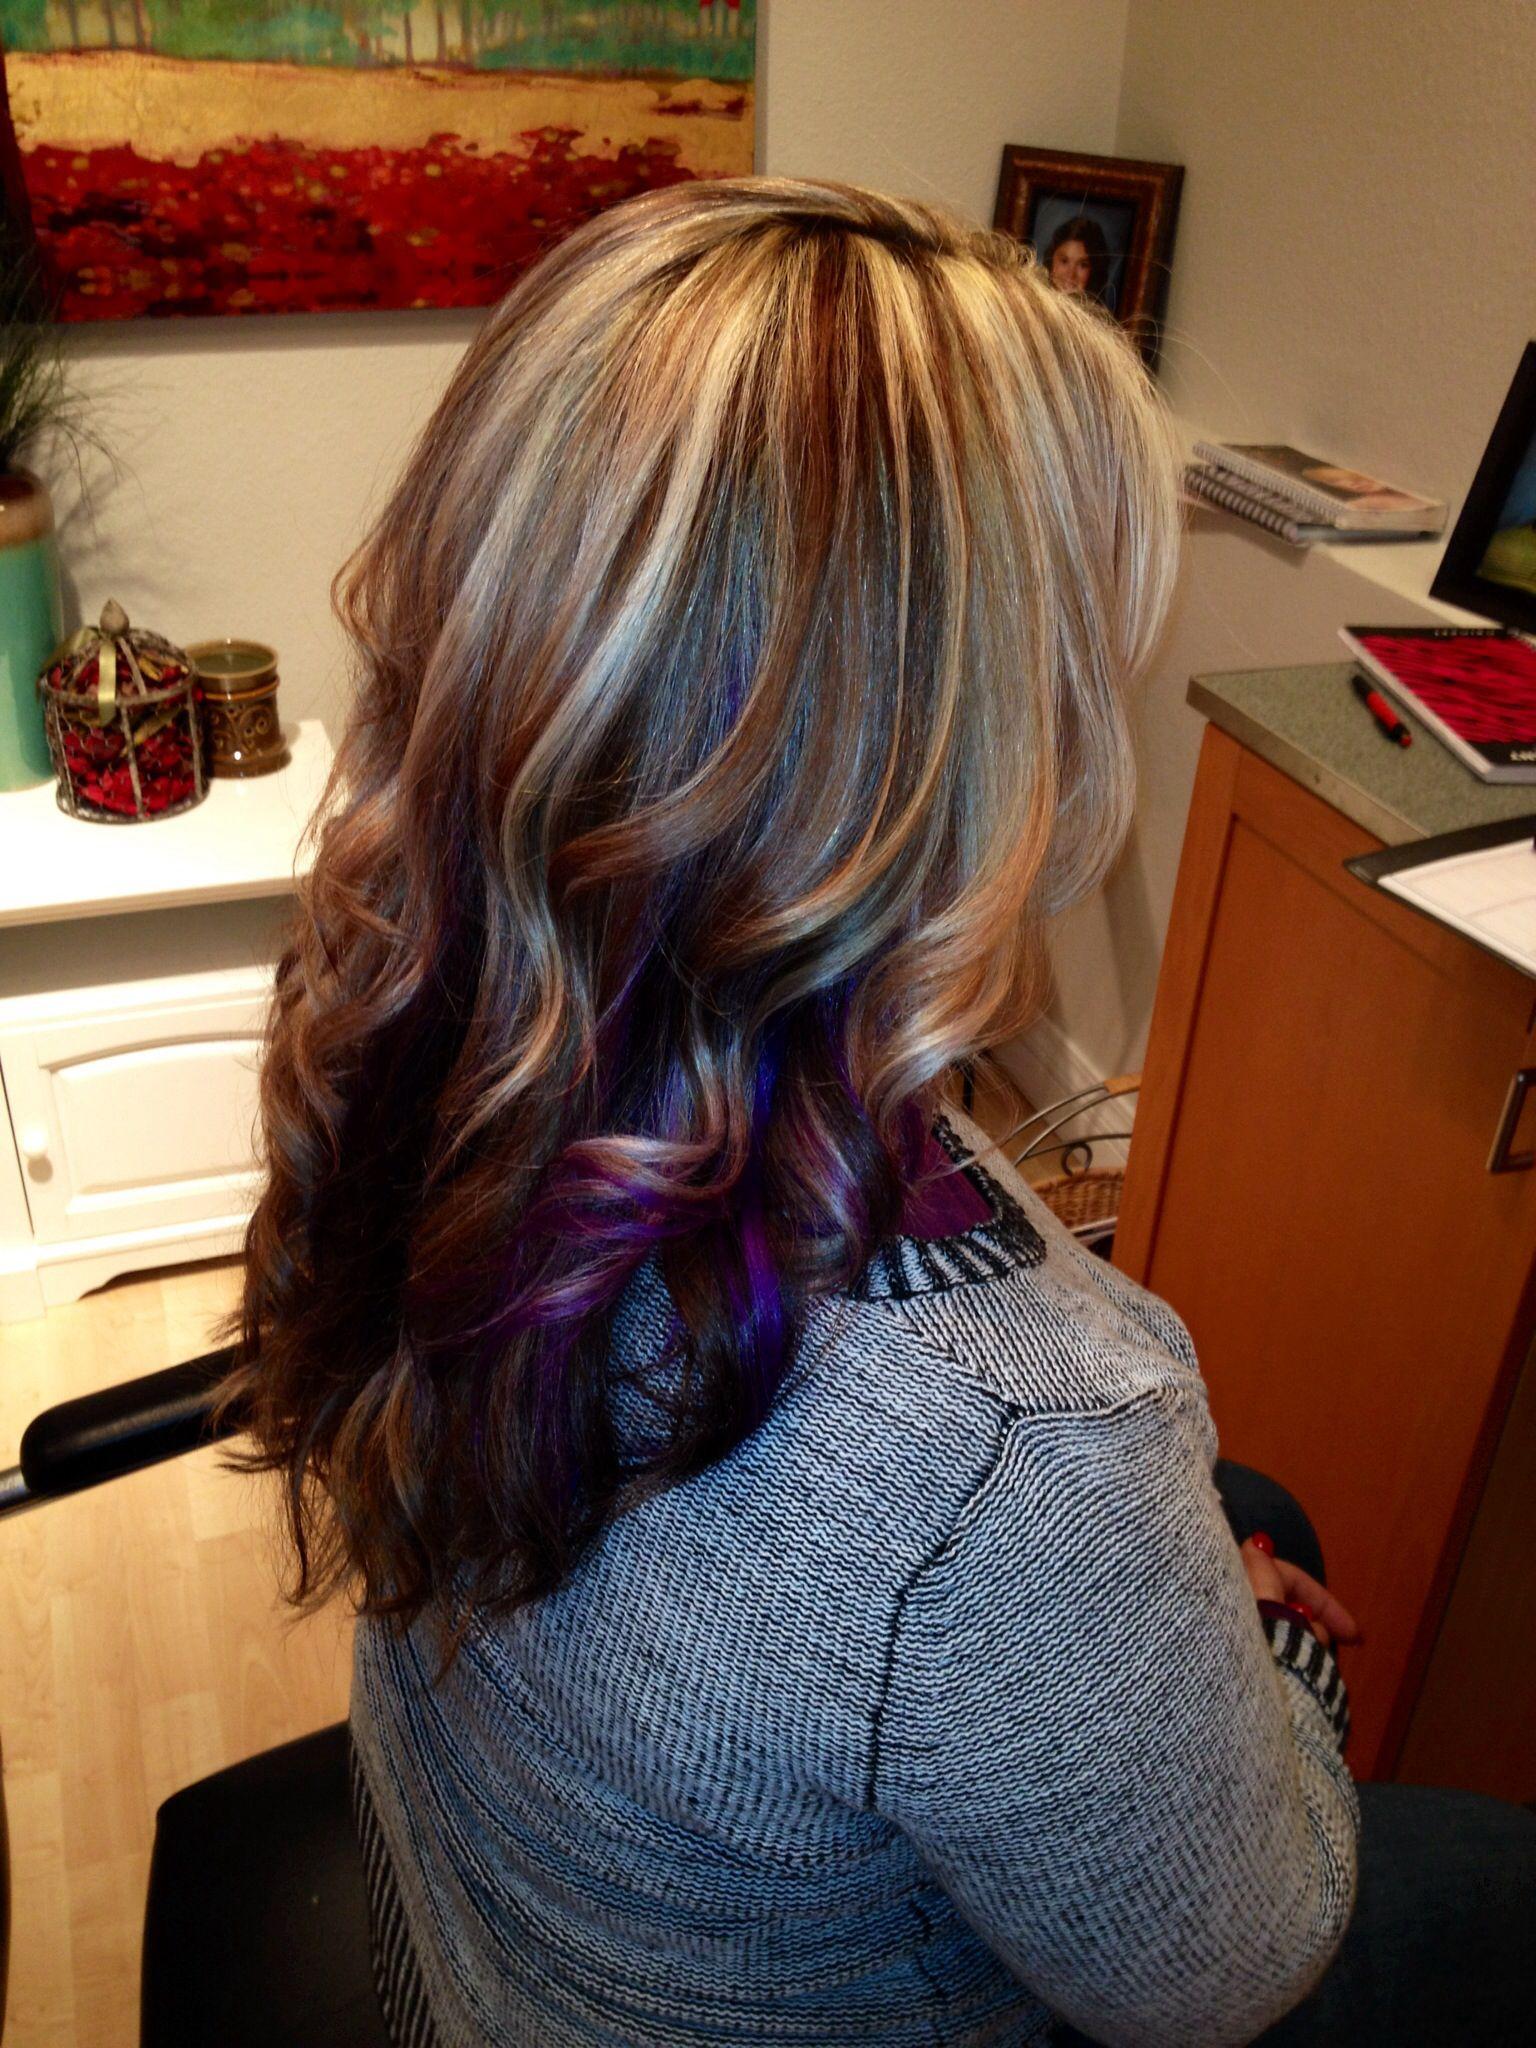 Highlights Lowlights And Peekaboo Purple So Much Fun